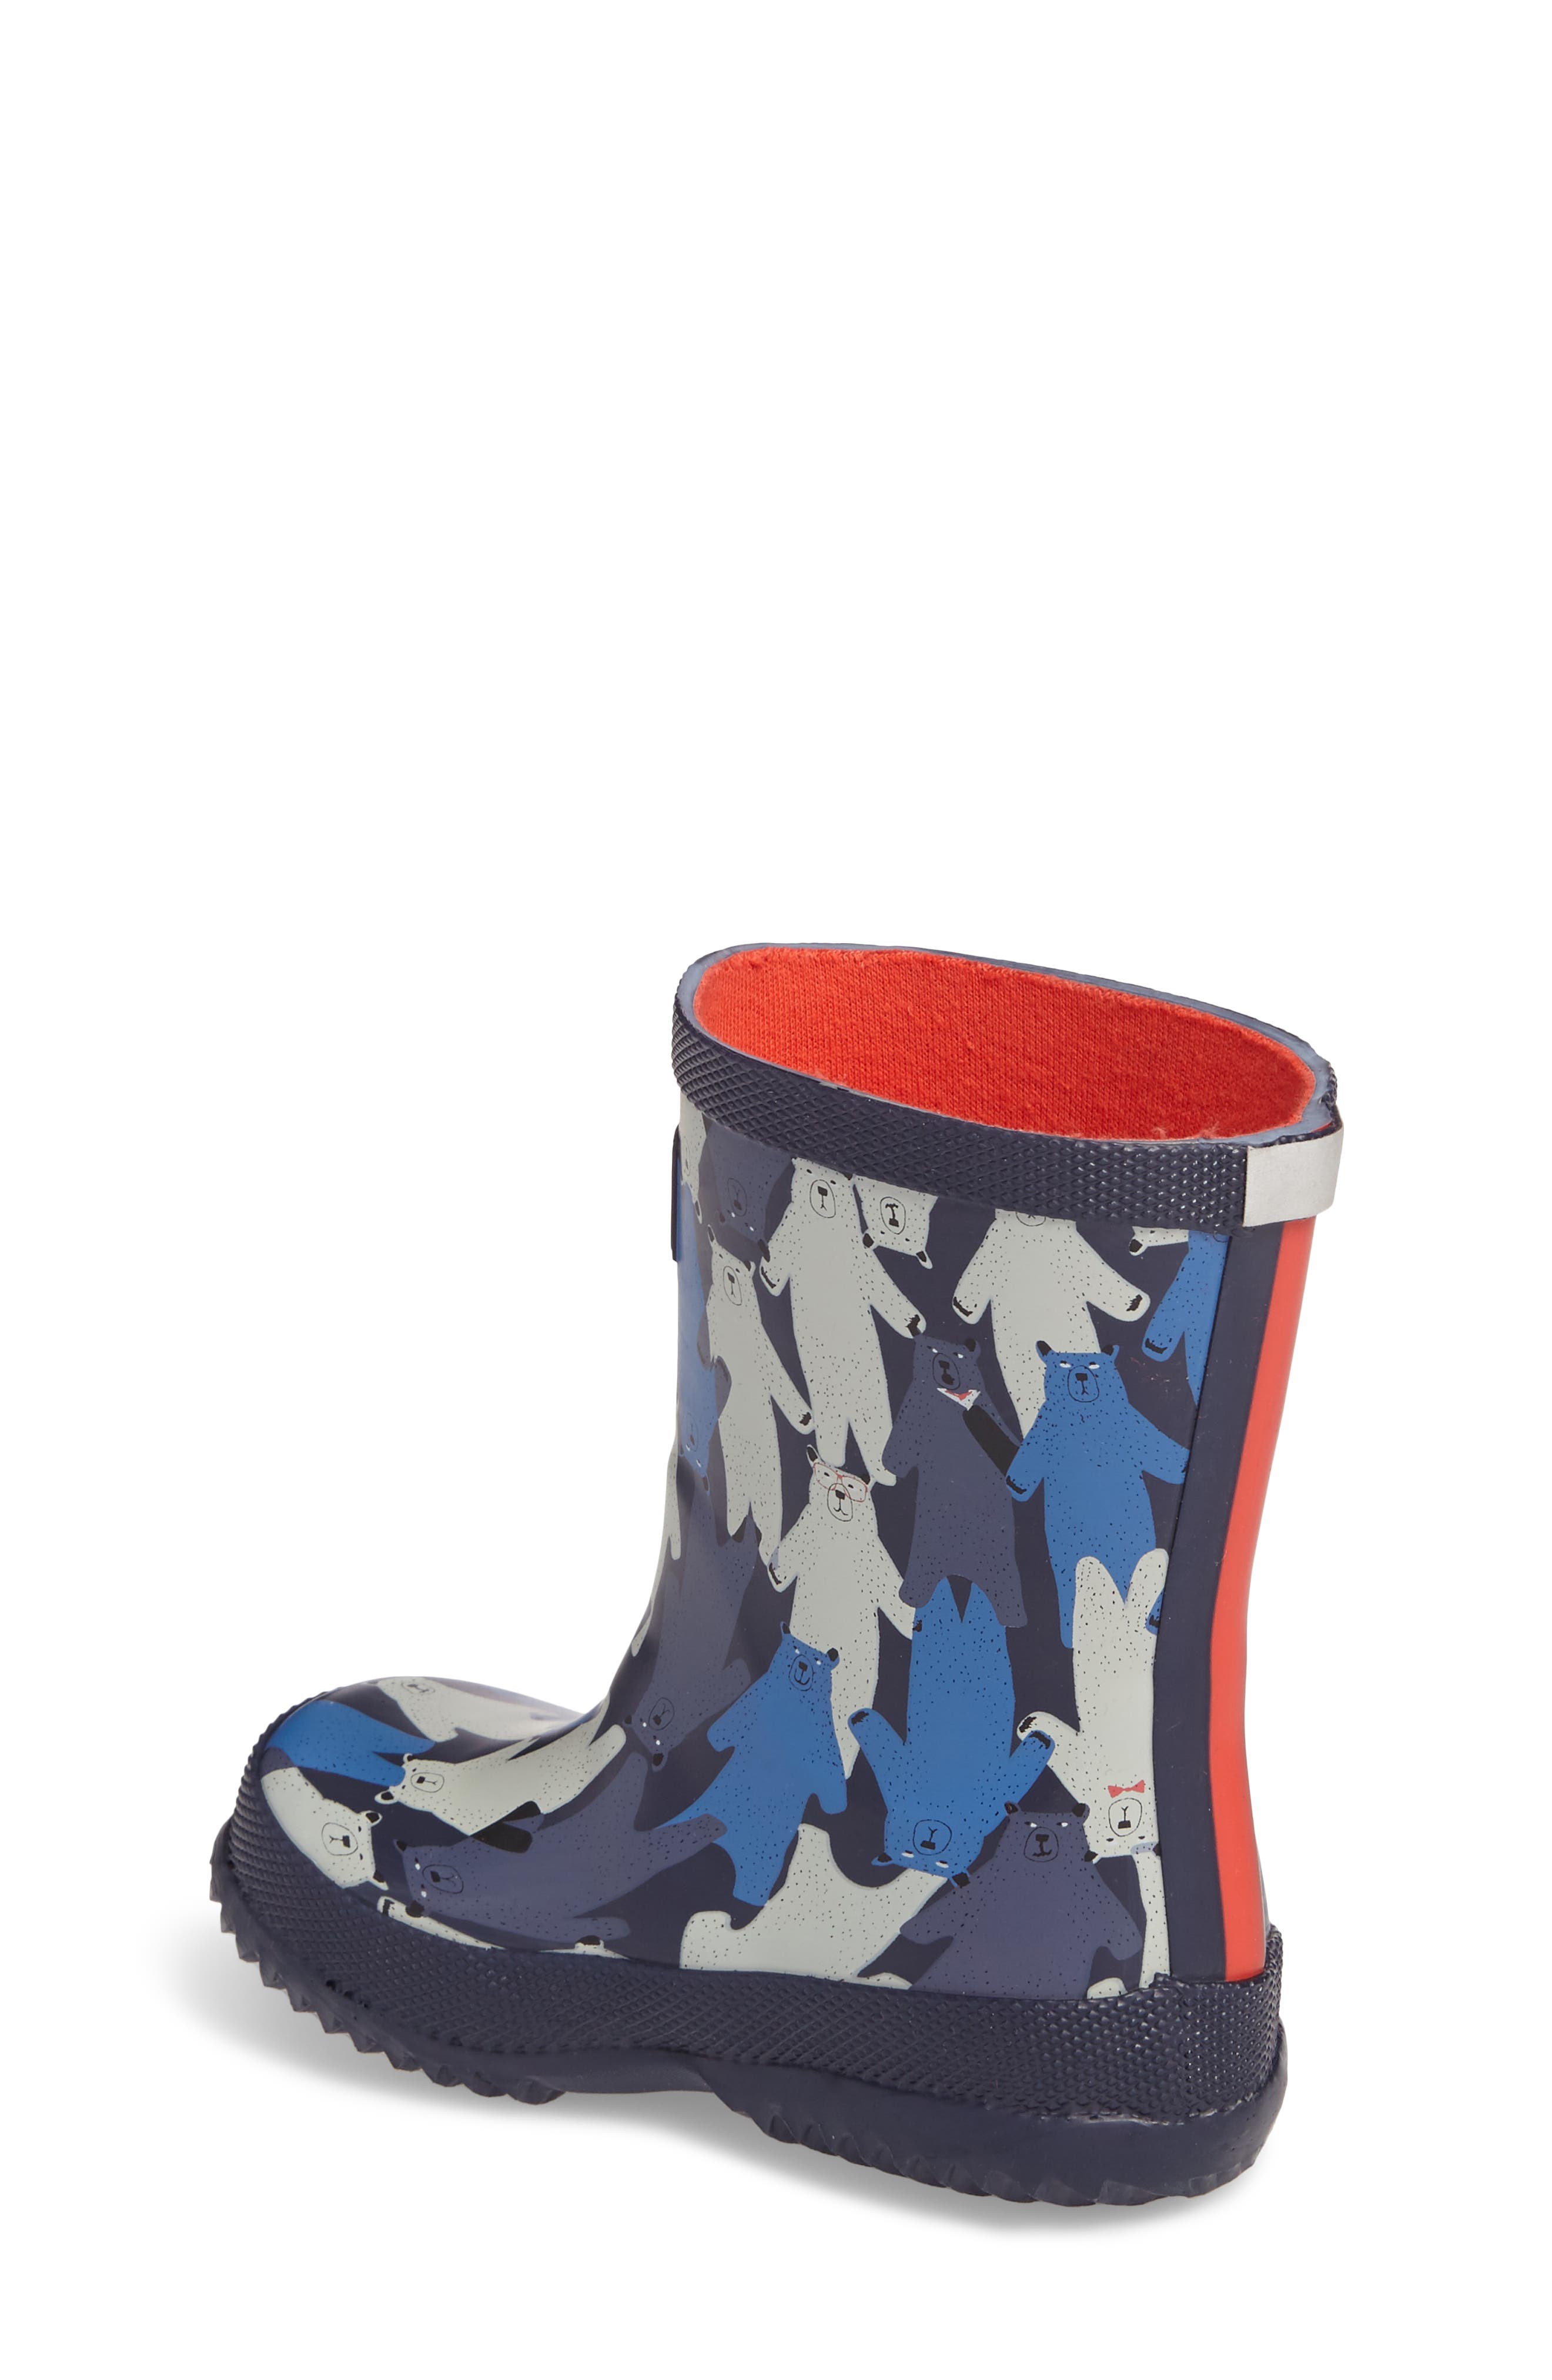 Printed Waterproof Rain Boot,                             Alternate thumbnail 2, color,                             Multi Bear Camo